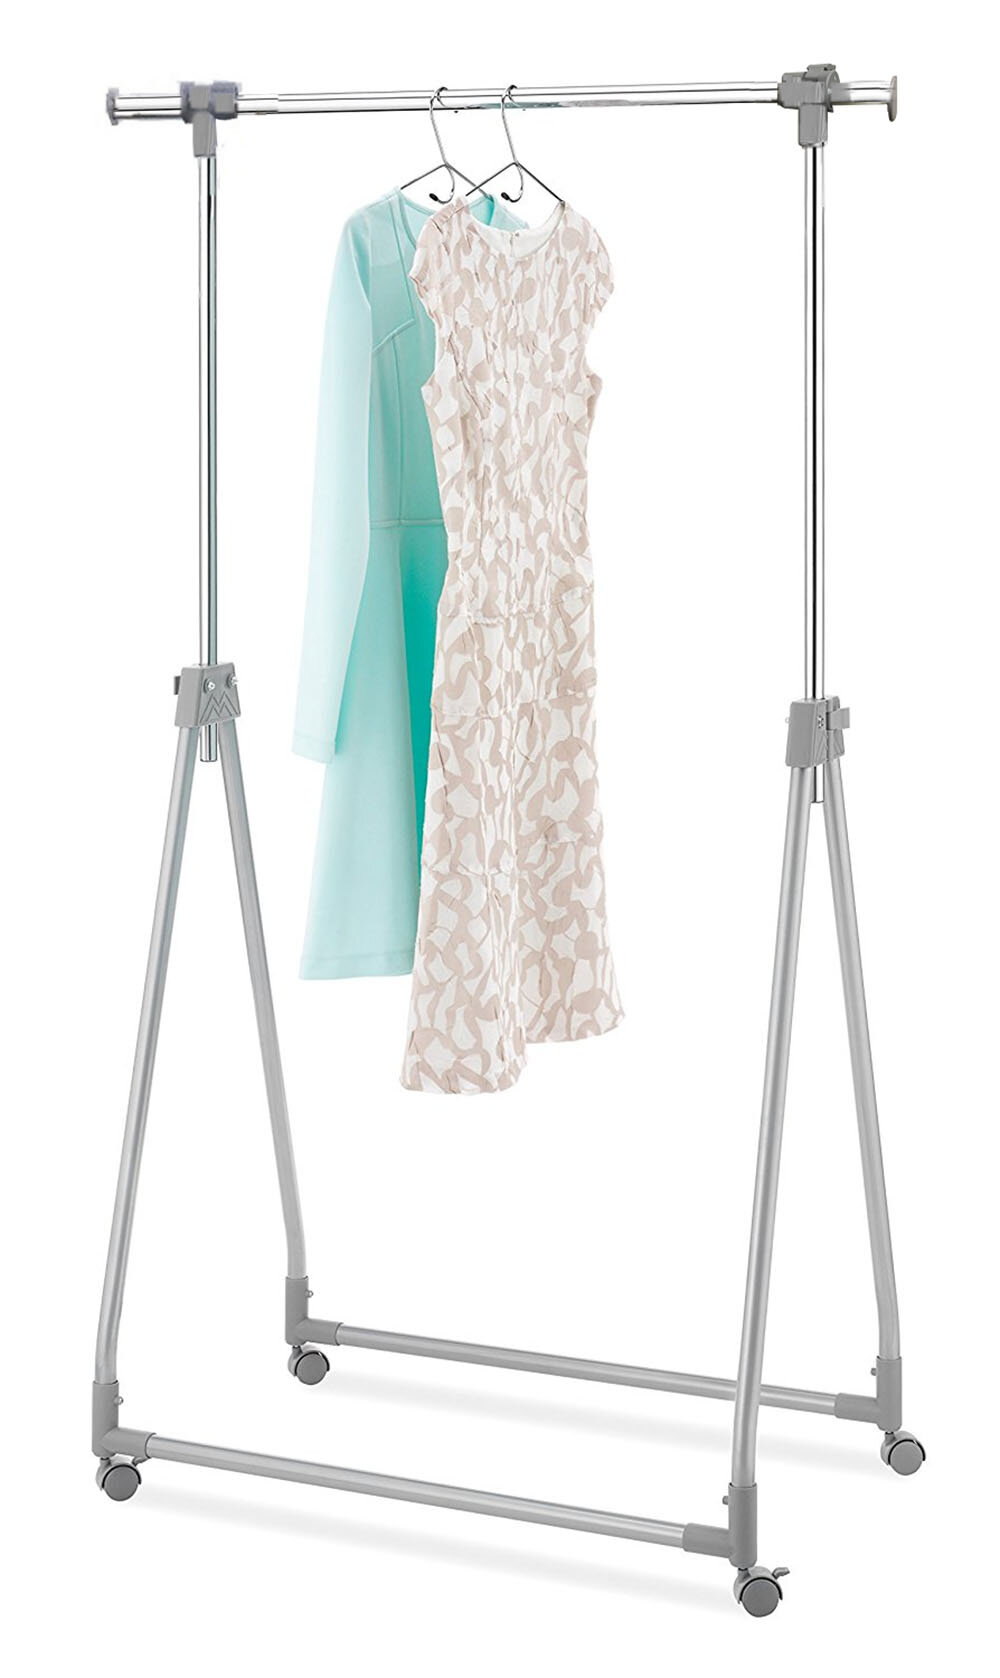 Wayfair basics collapsible 120cm wide clothes rack reviews wayfair co uk